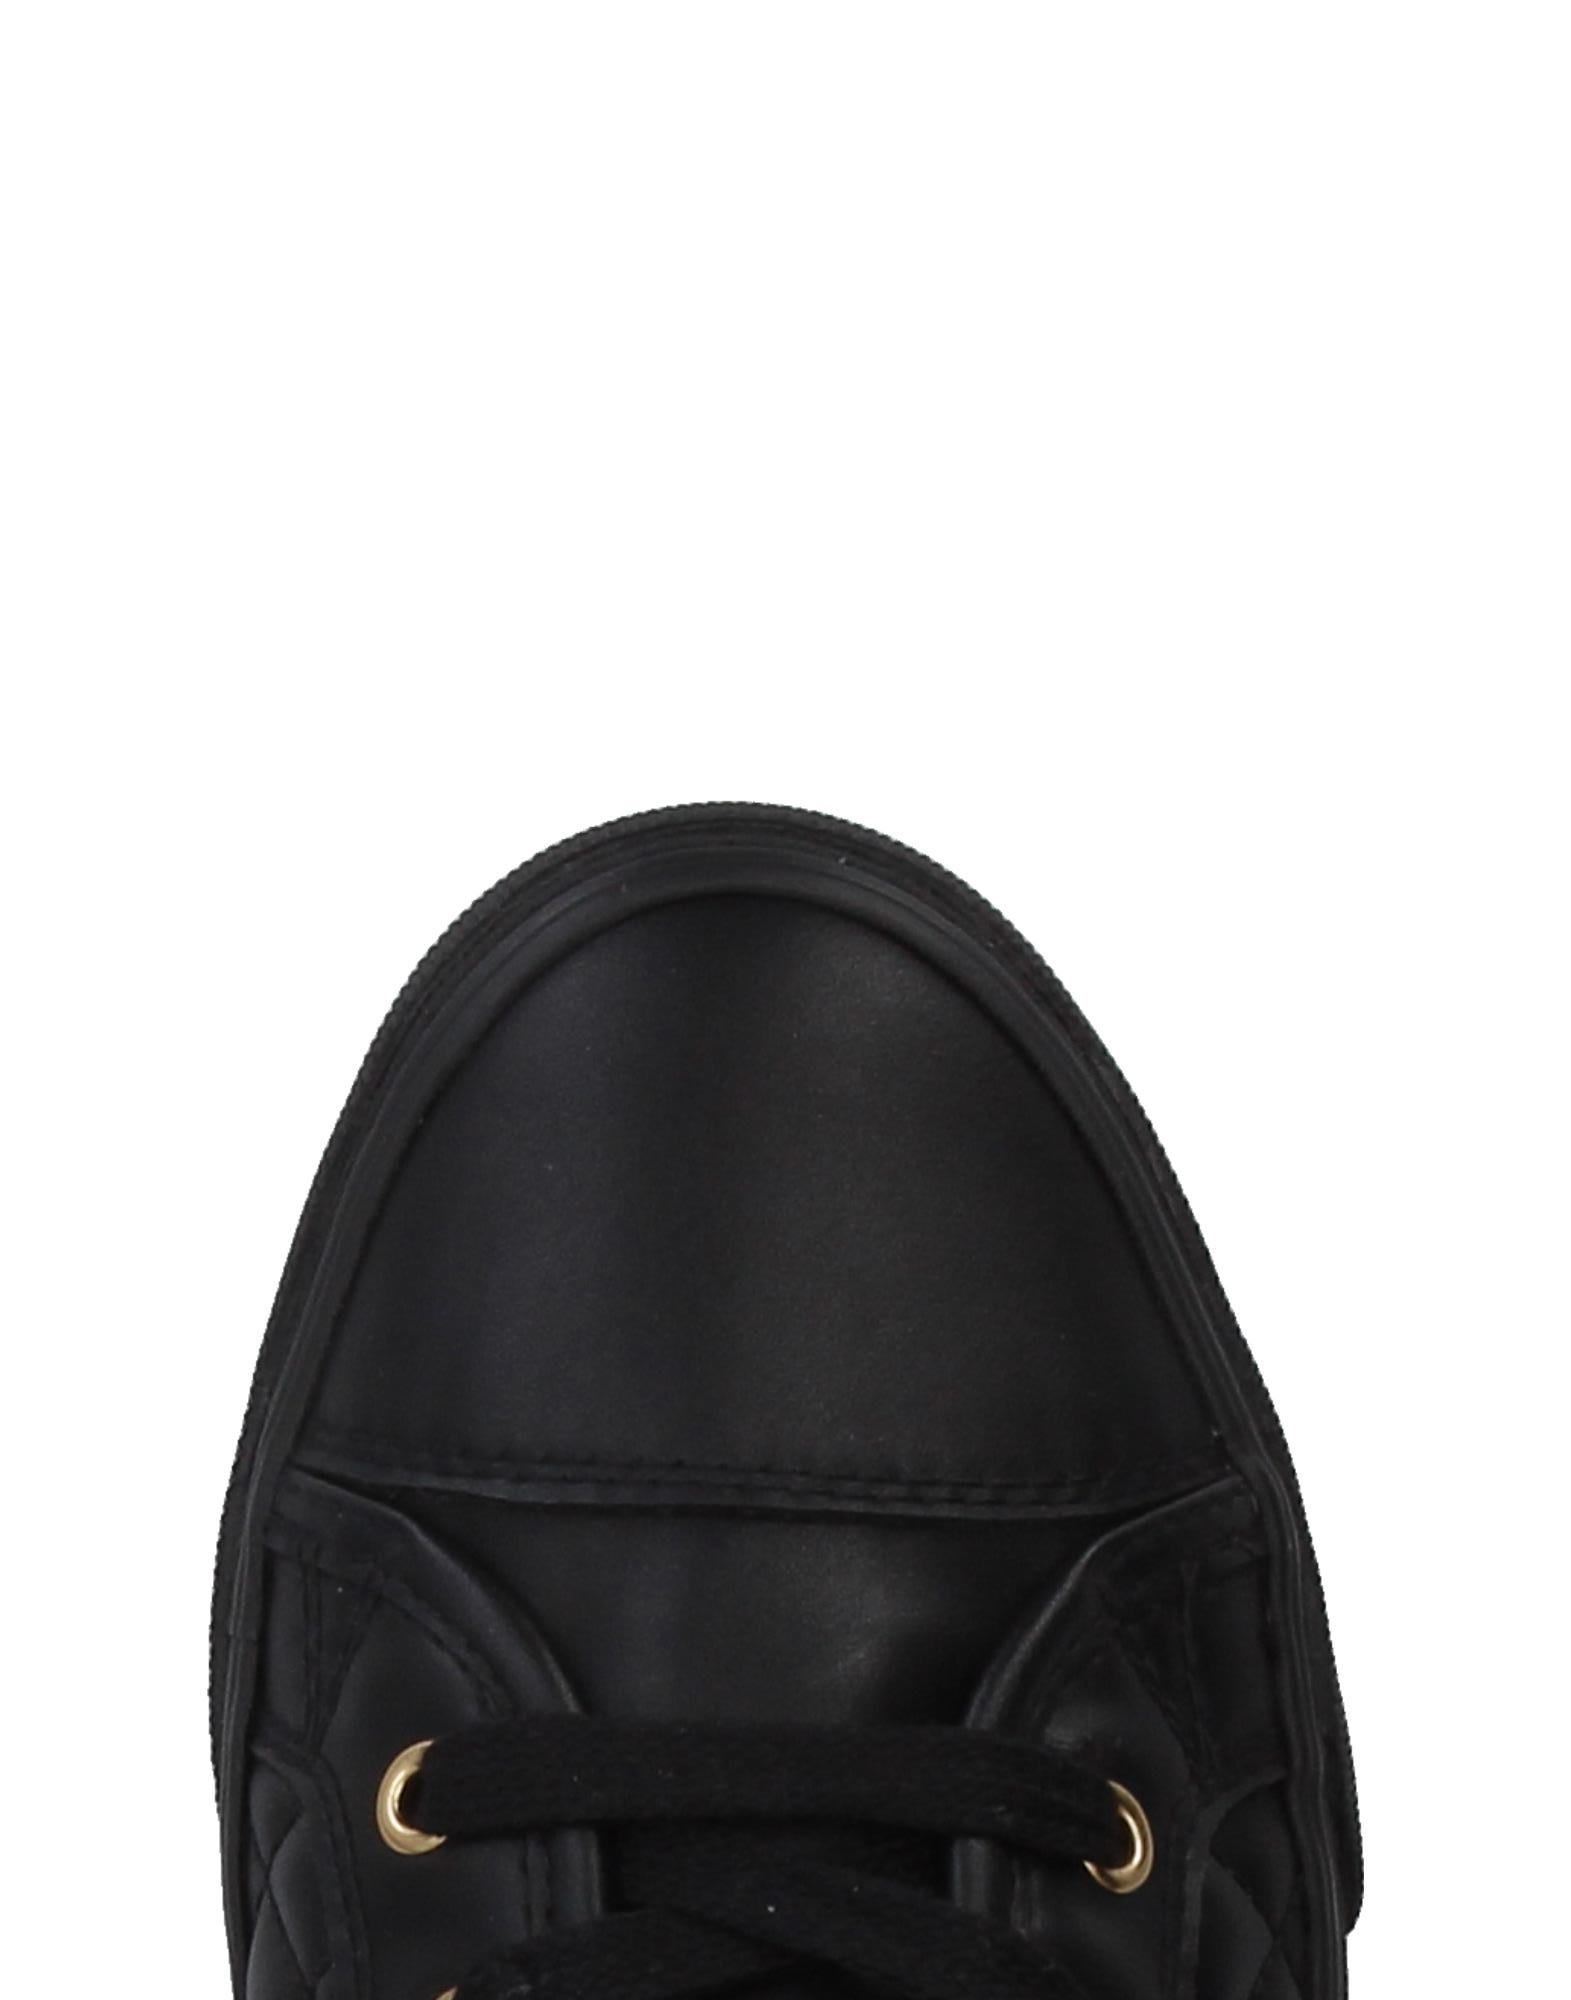 Geox Sneakers Gute Damen  11409367BF Gute Sneakers Qualität beliebte Schuhe af17ad